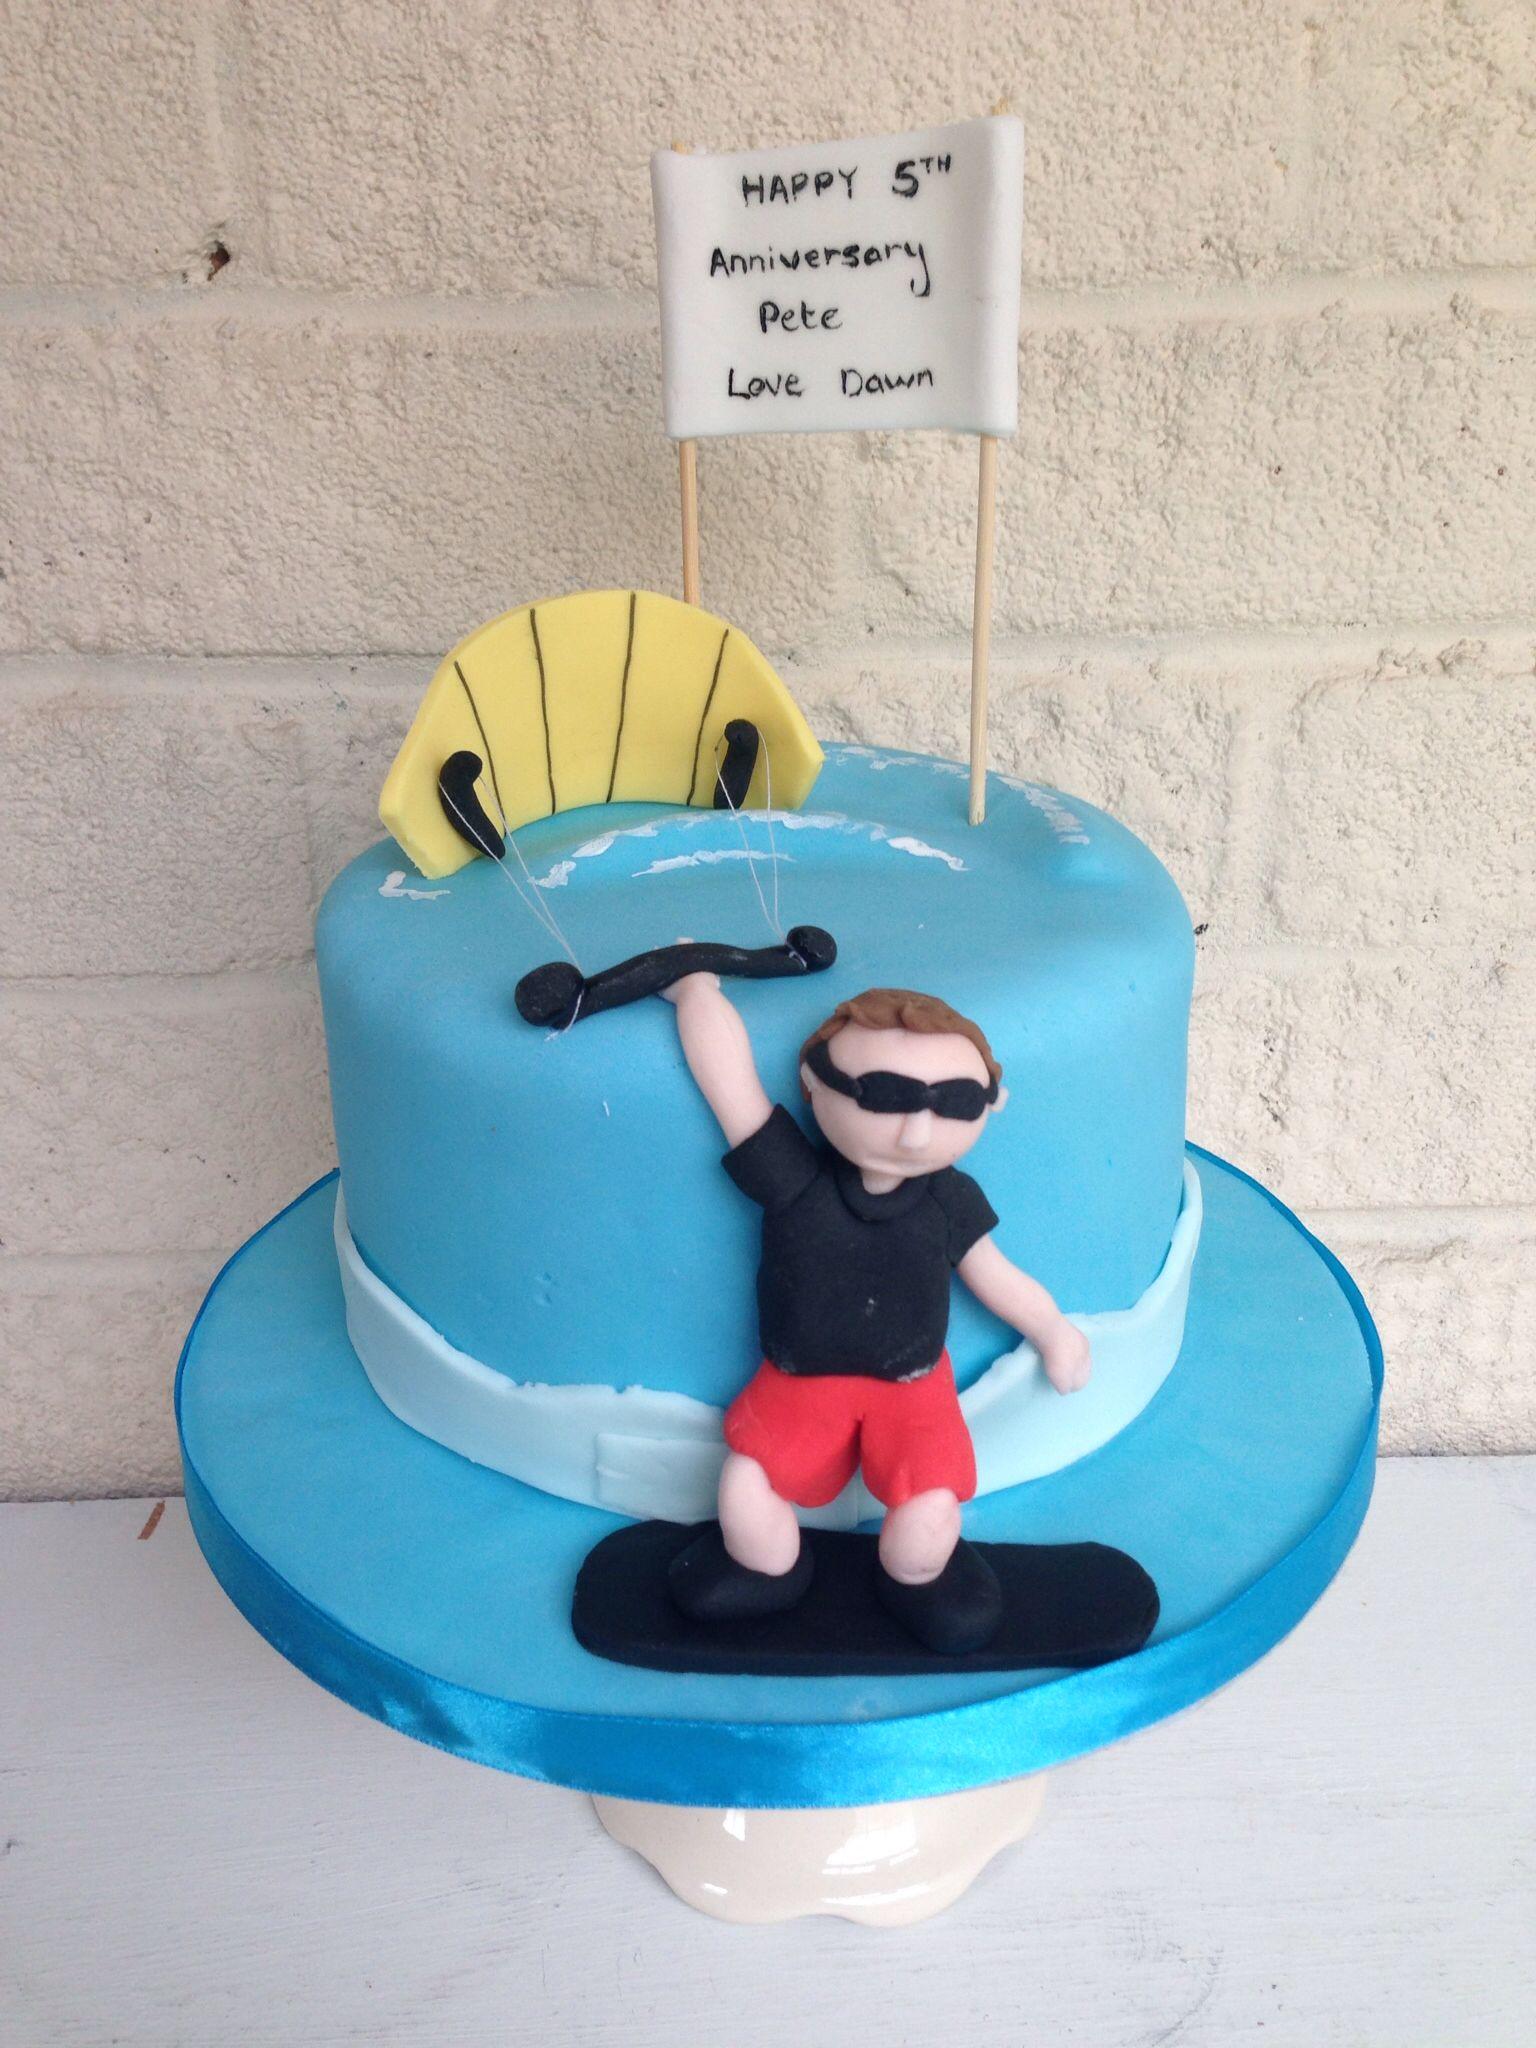 Kite Surfer Cake